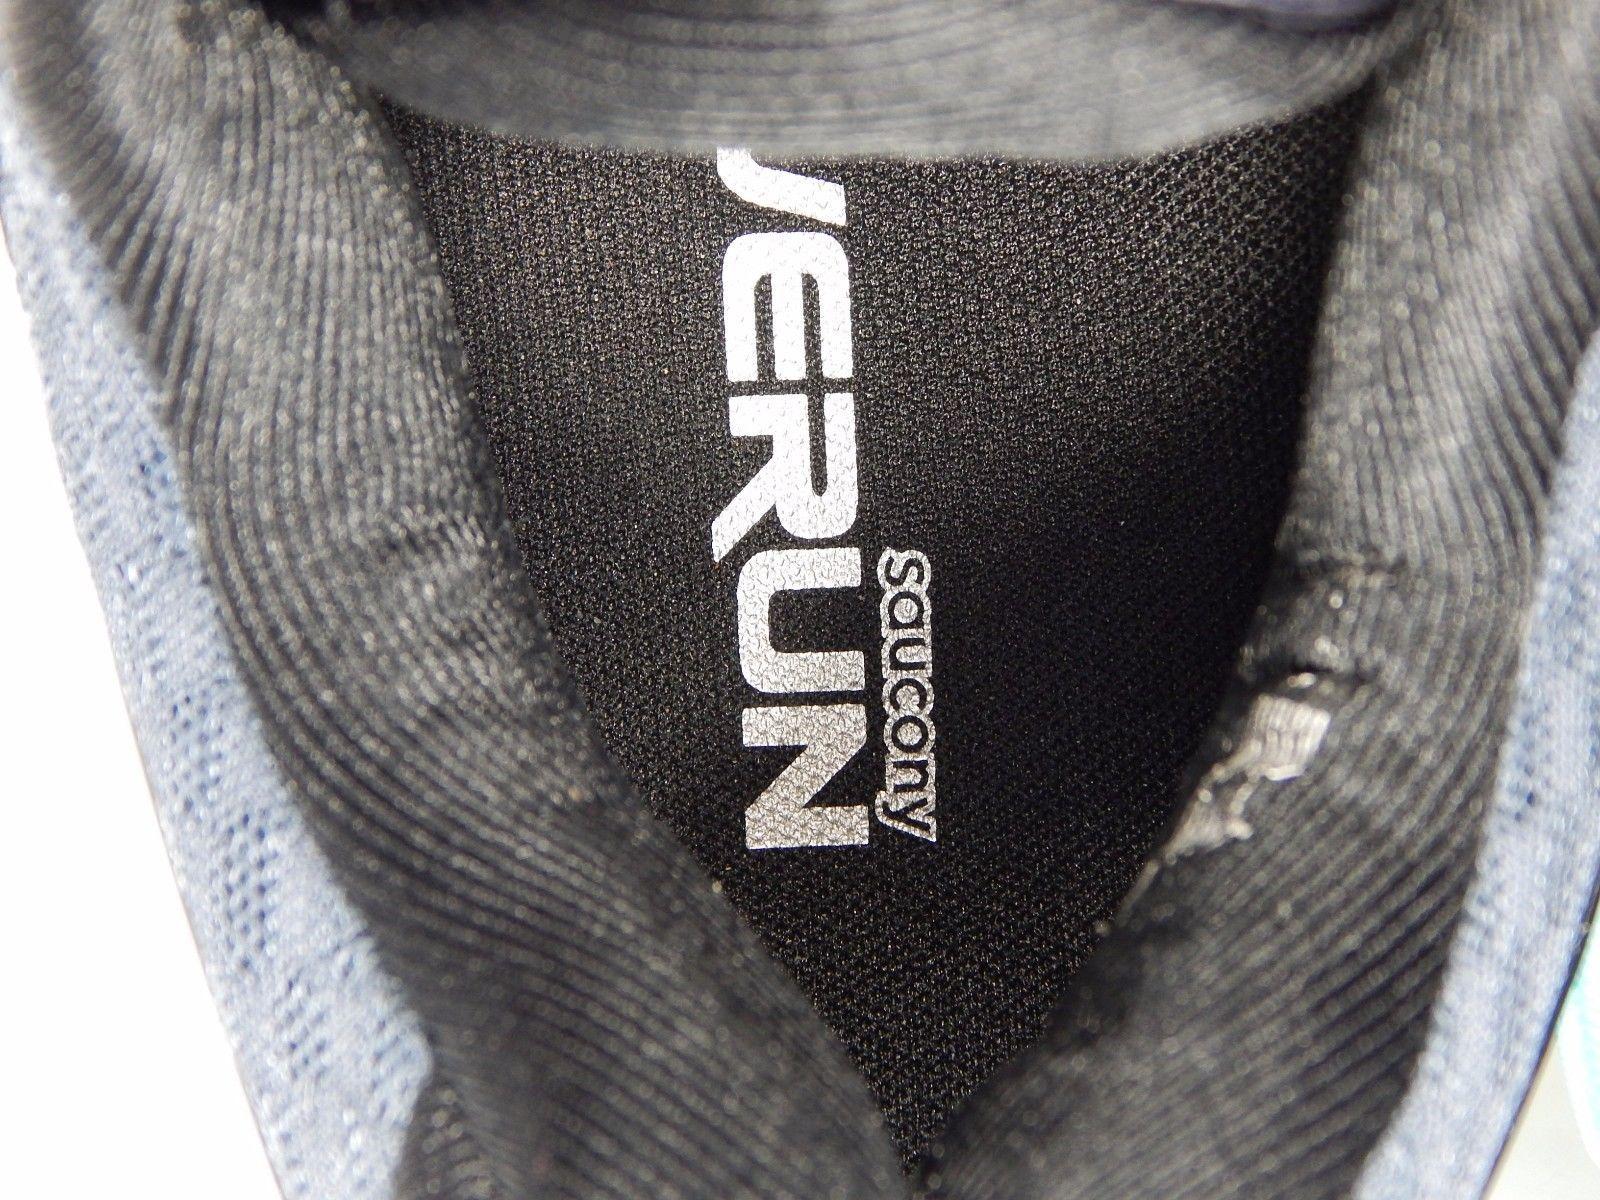 Saucony Triumph ISO 2 Women's Running Shoes Size US 9.5 D WIDE EU 41 S10291-1